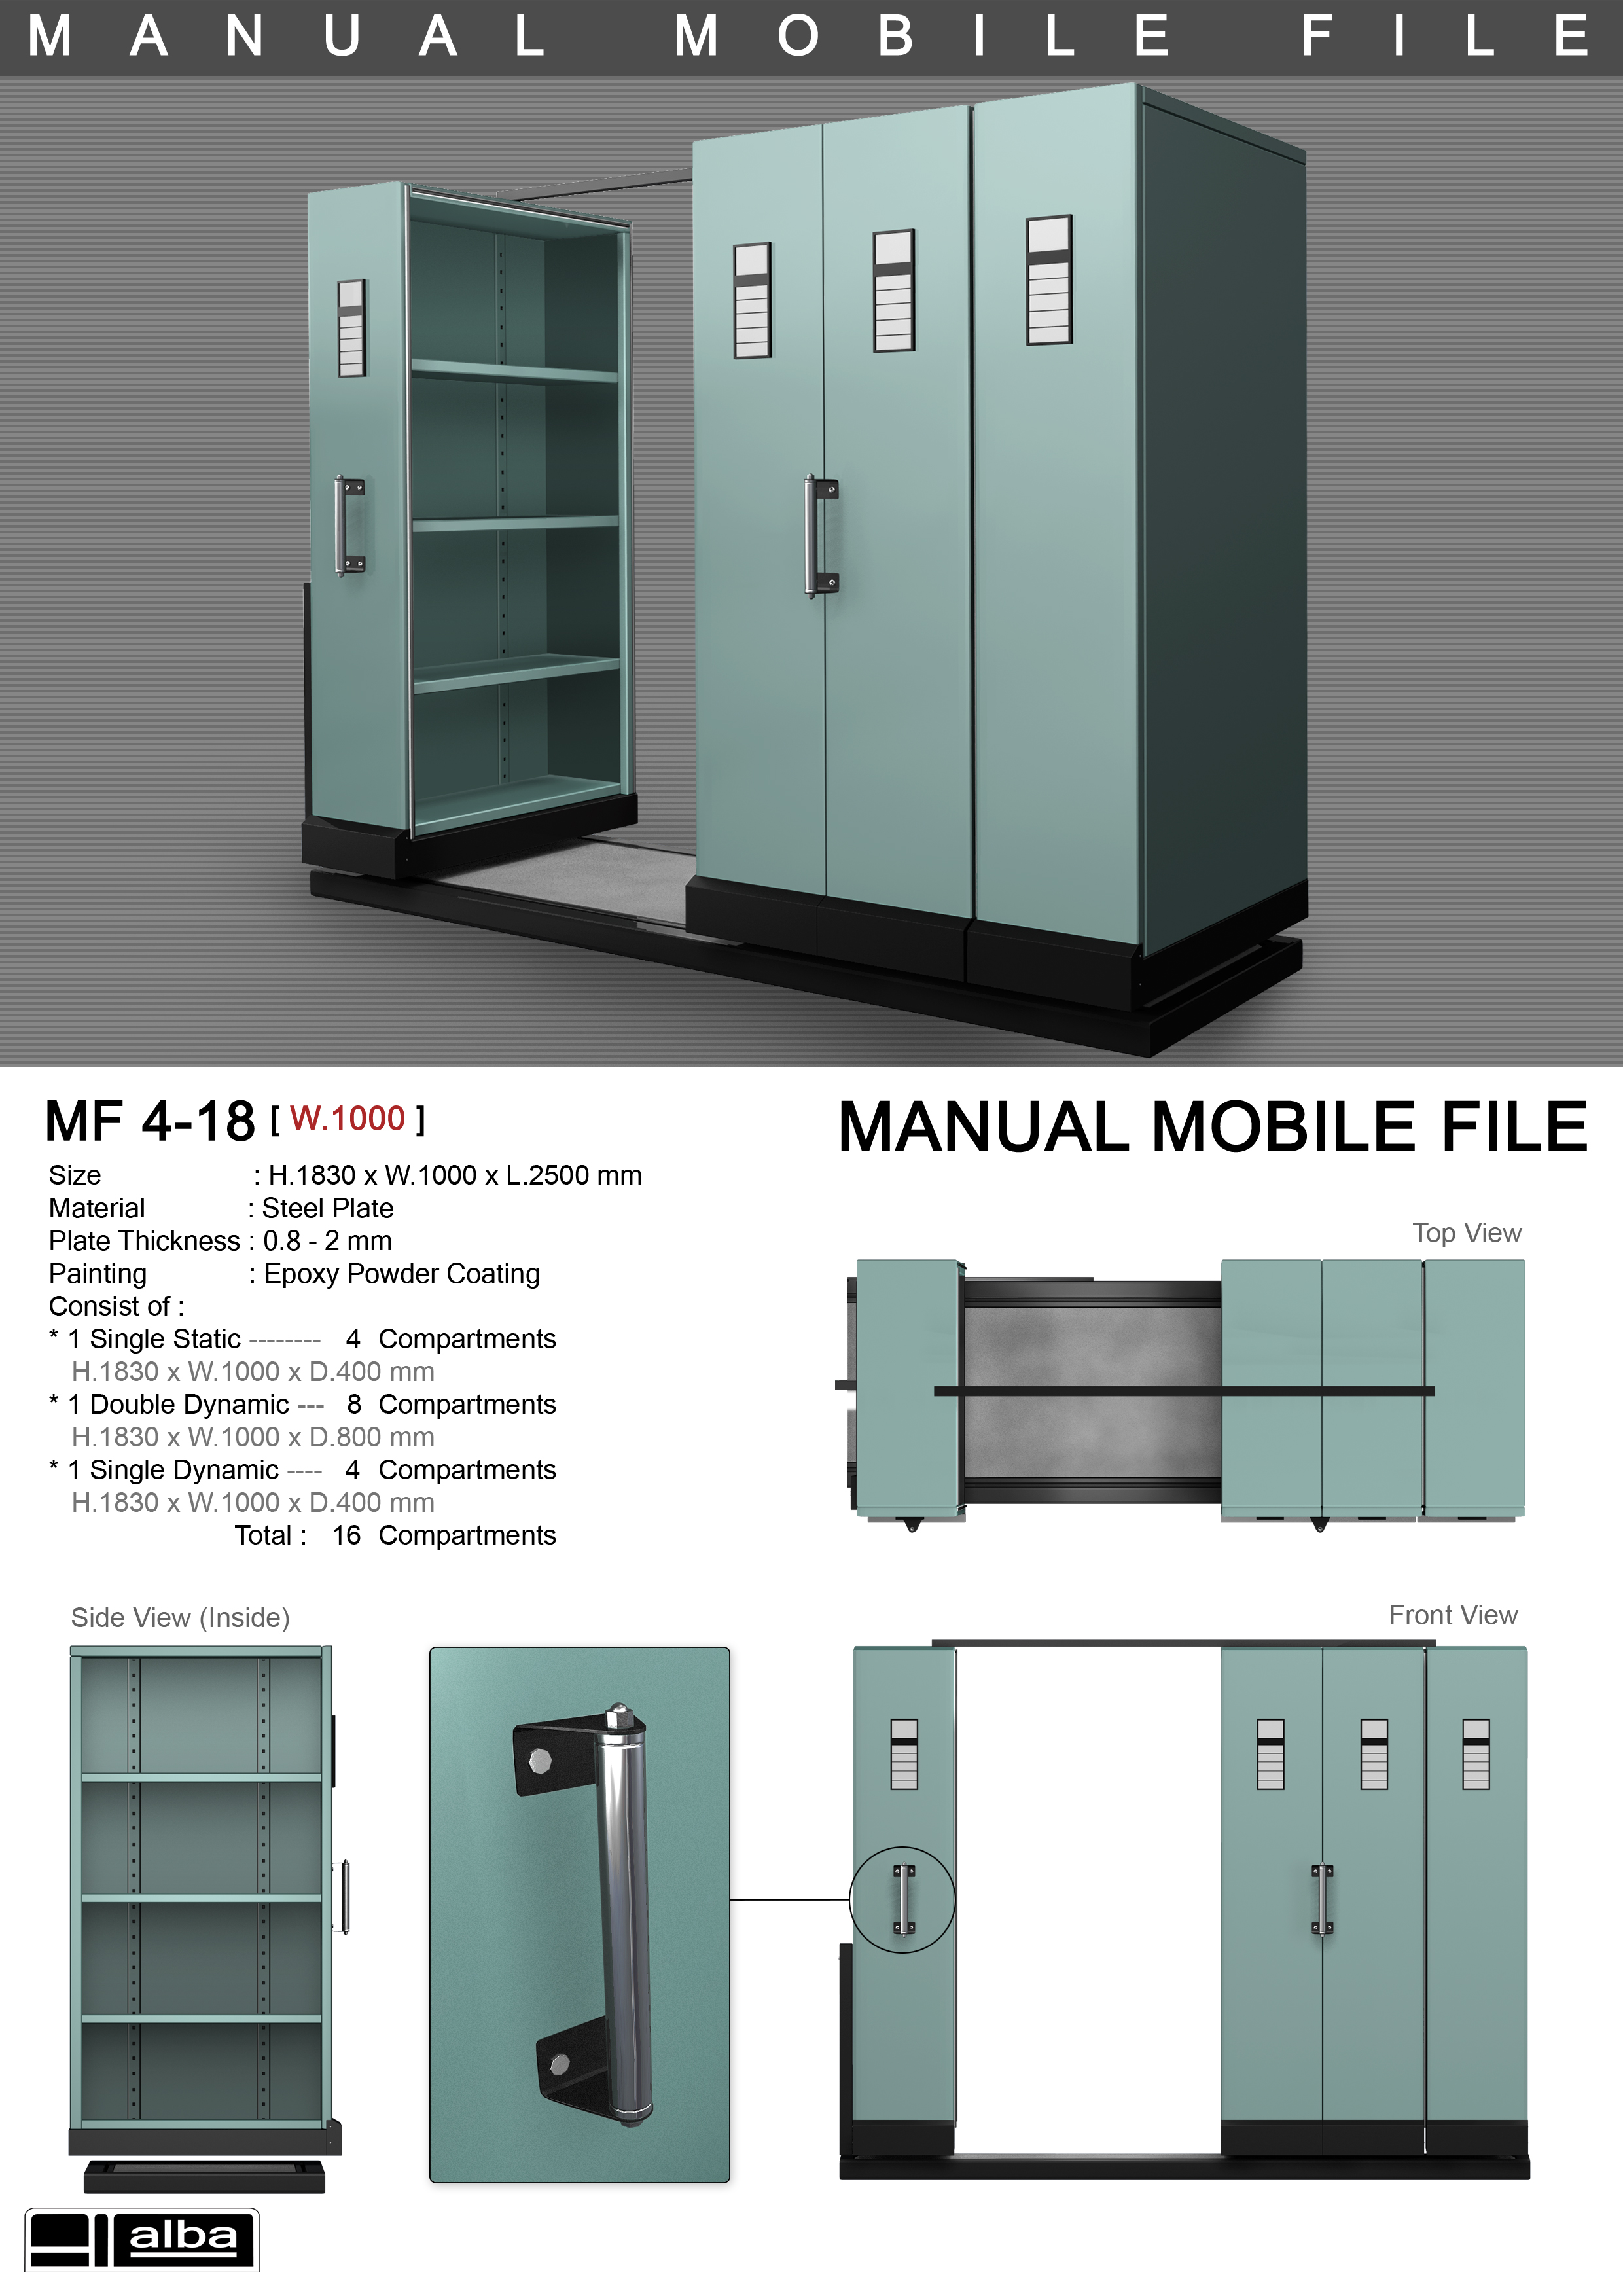 Mobile File Manual Alba 4-18